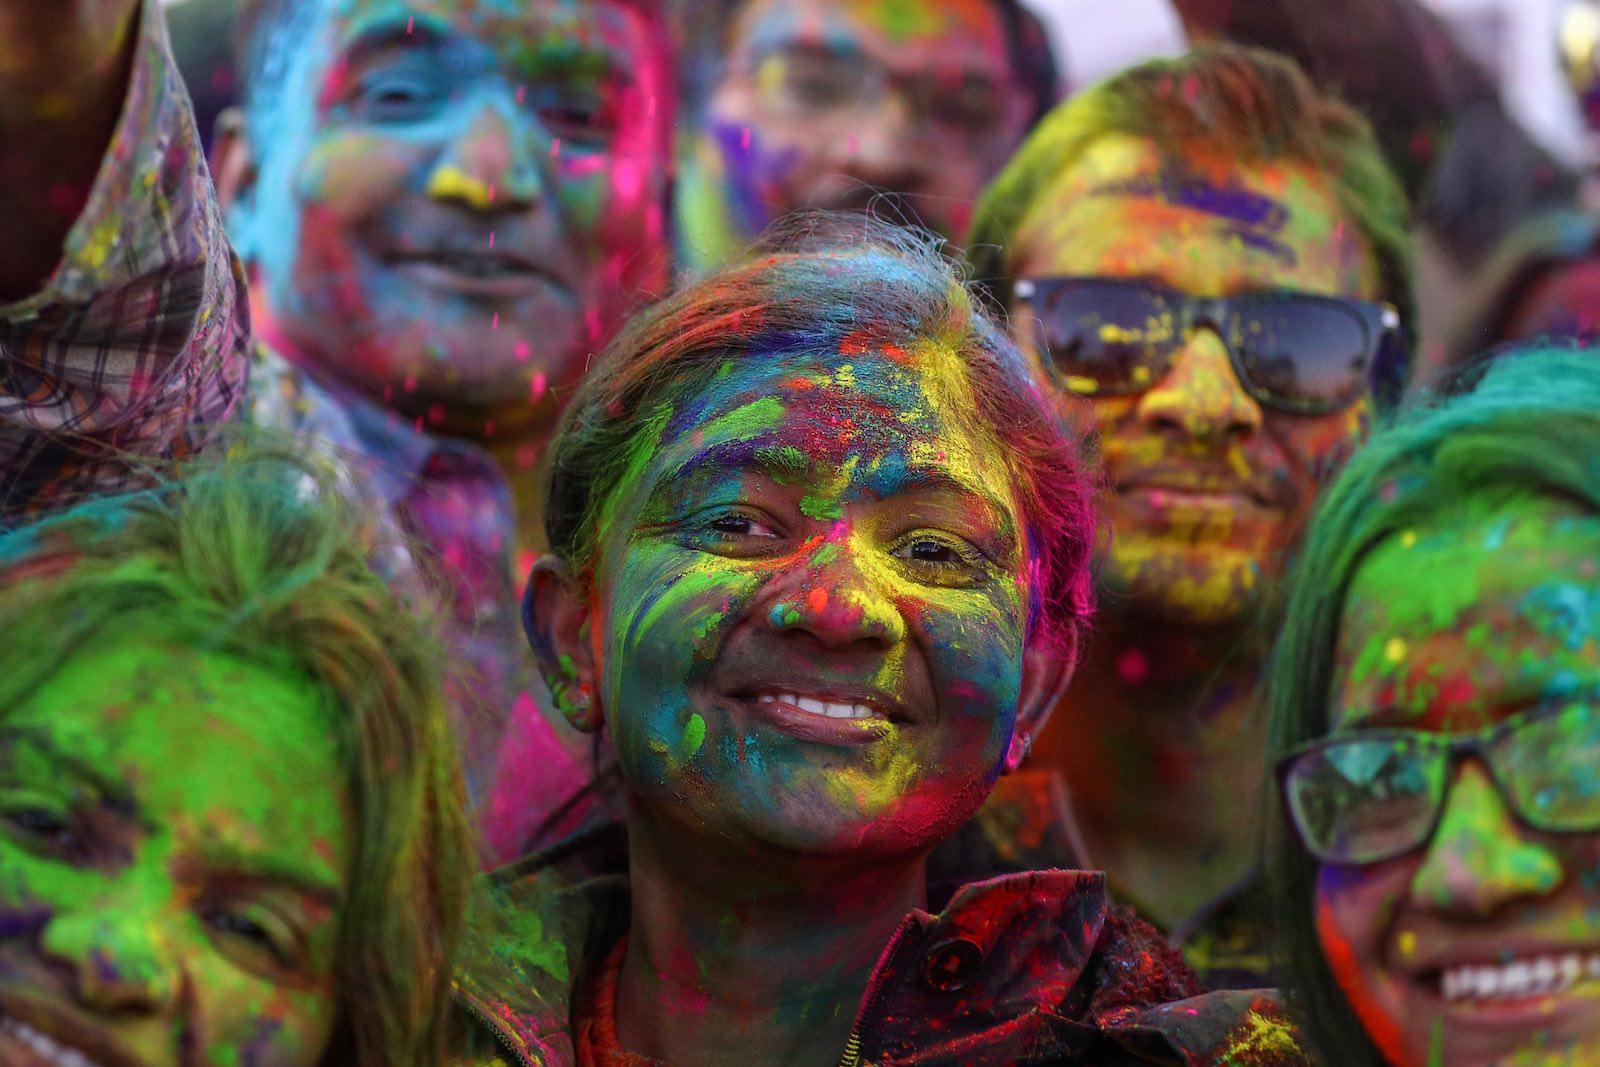 Holi Festival celebrations in Chicago (Photo: Bilgin S. Sasmaz via Getty)